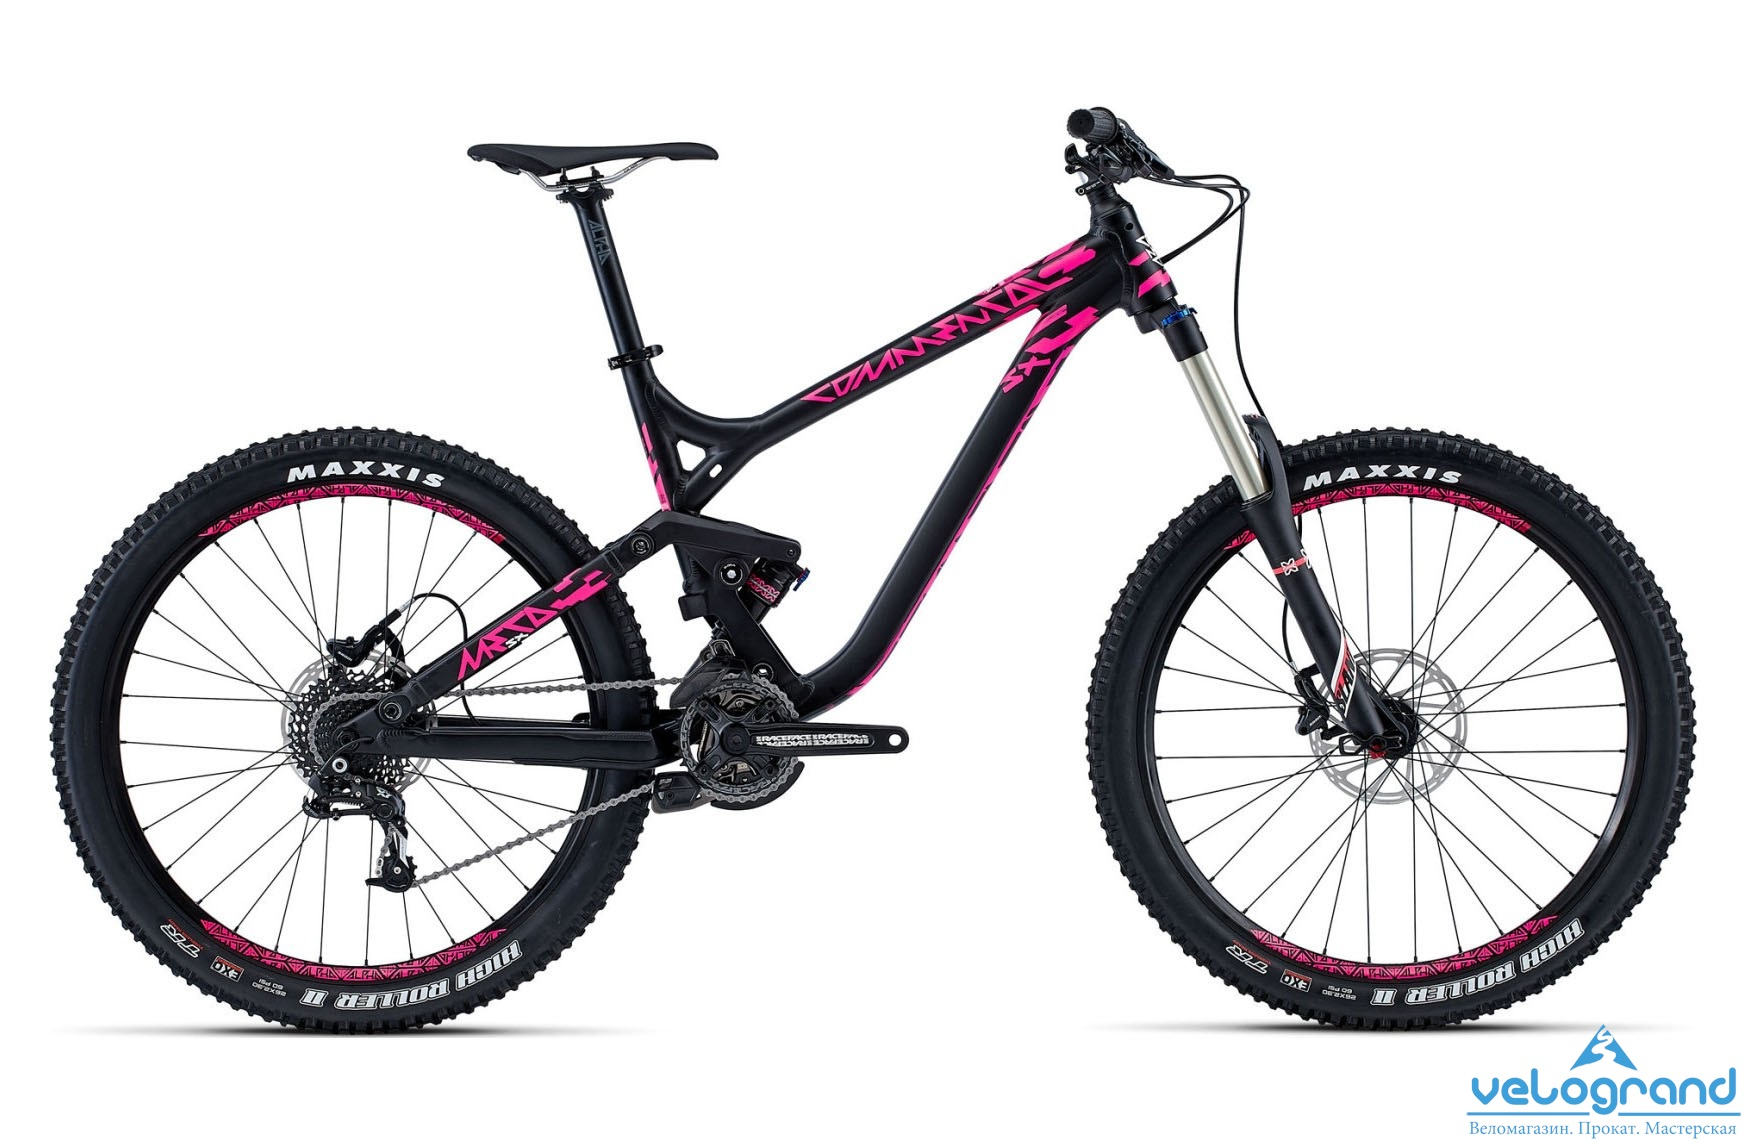 Велосипед двухподвес Commencal META SX Origin (2015) от Velogrand